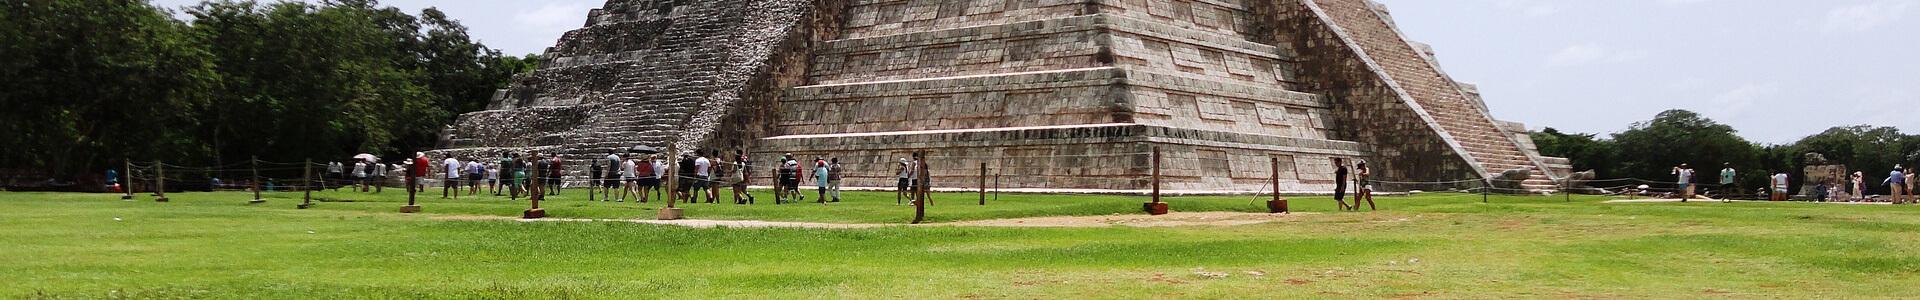 sim-card-prepago-internacional-mexico